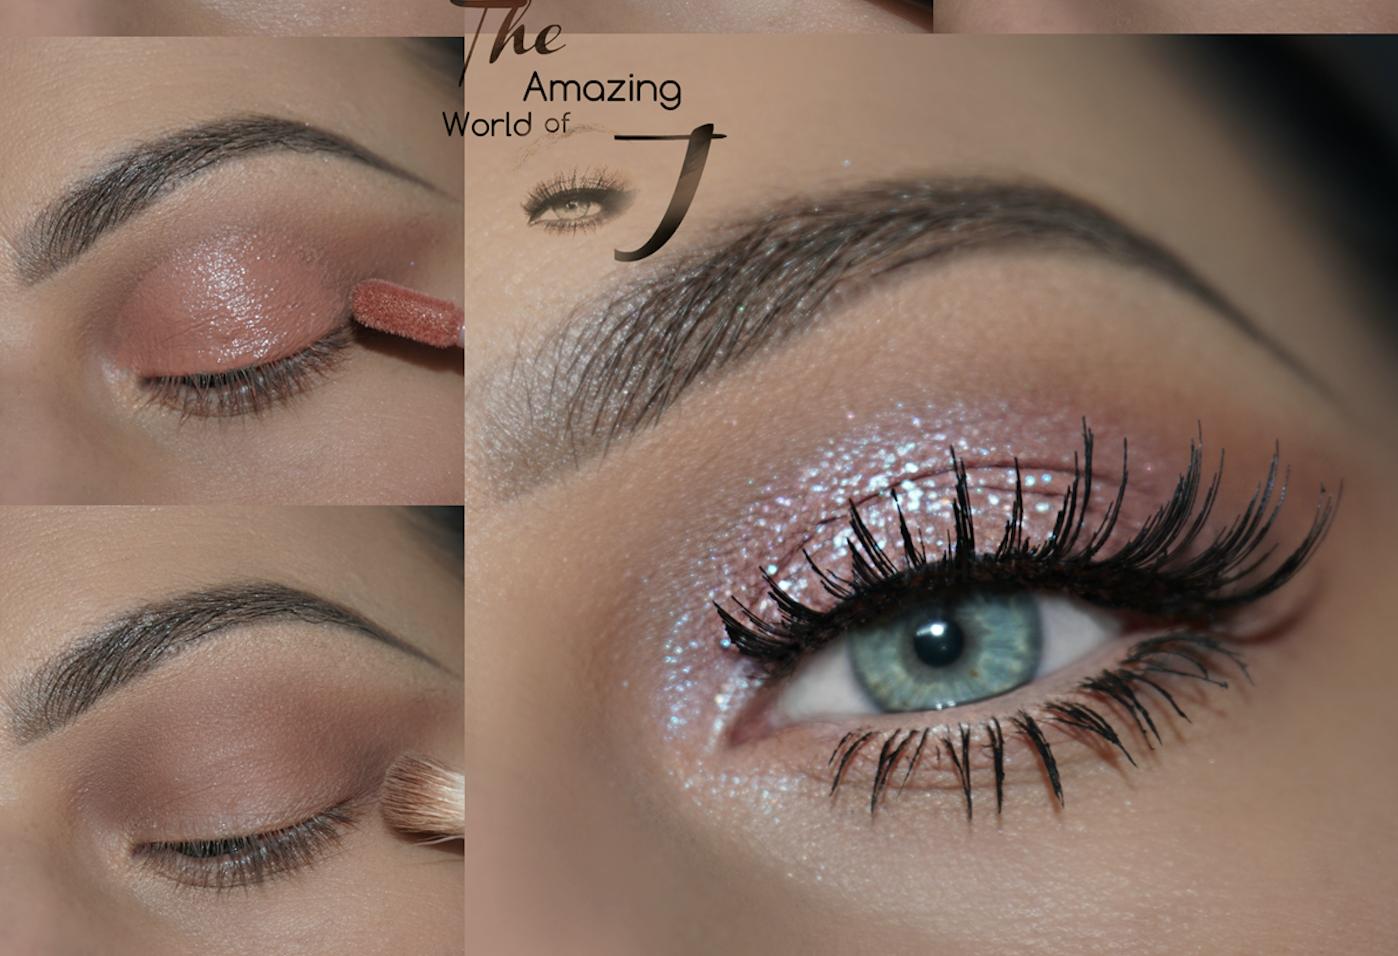 Get The Look With Motives®: &Quot;Starshine&Quot; Makeup Tutorial - Loren&039;S World - Makeup Tutorials